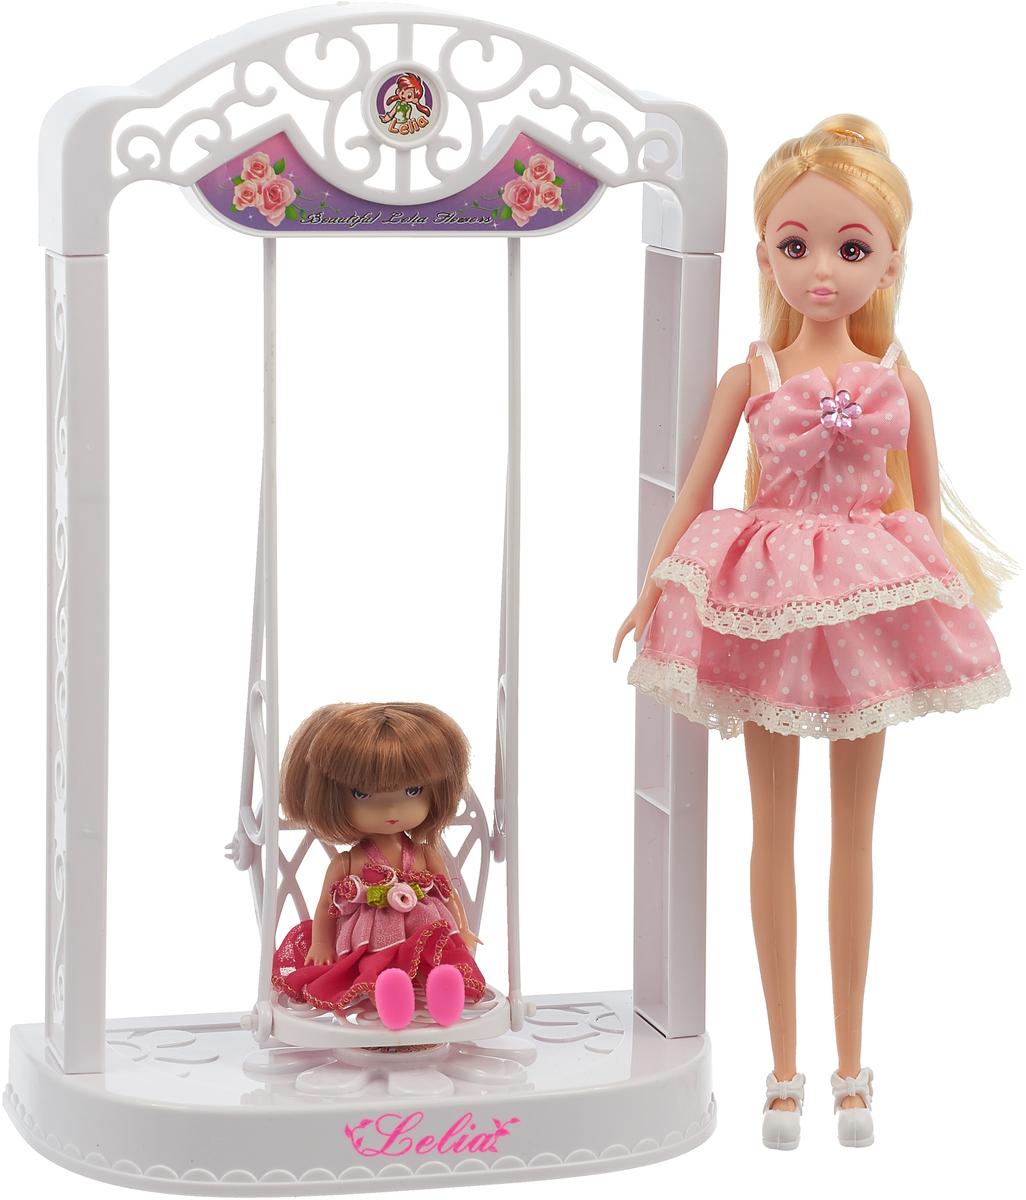 электронные качели Bradex Кукла Лелия с качелями